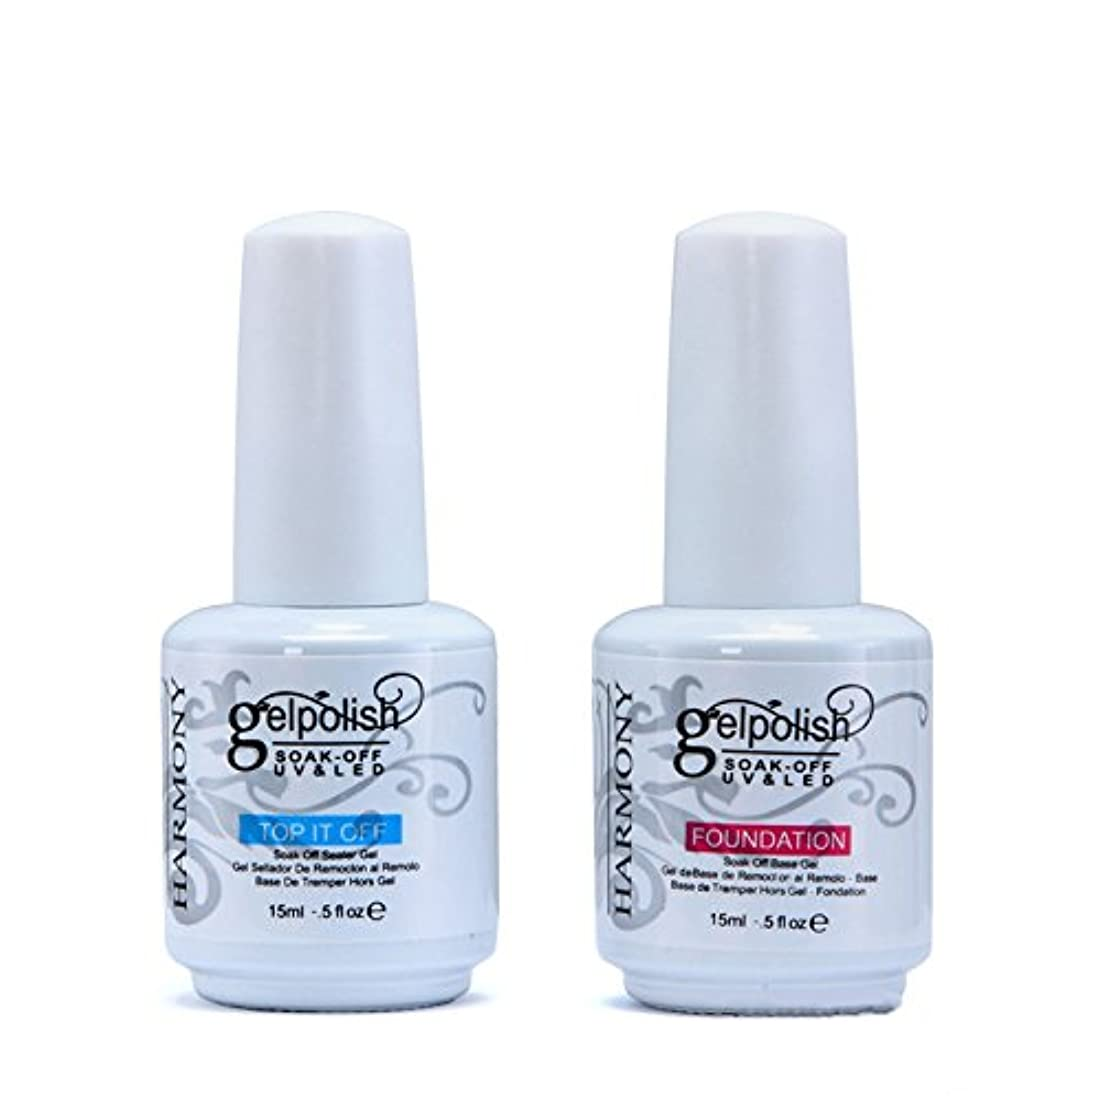 Rabugoo 非毒性の安全なネイルポリッシュジェルトップシーリング接着剤またはボトムグルー